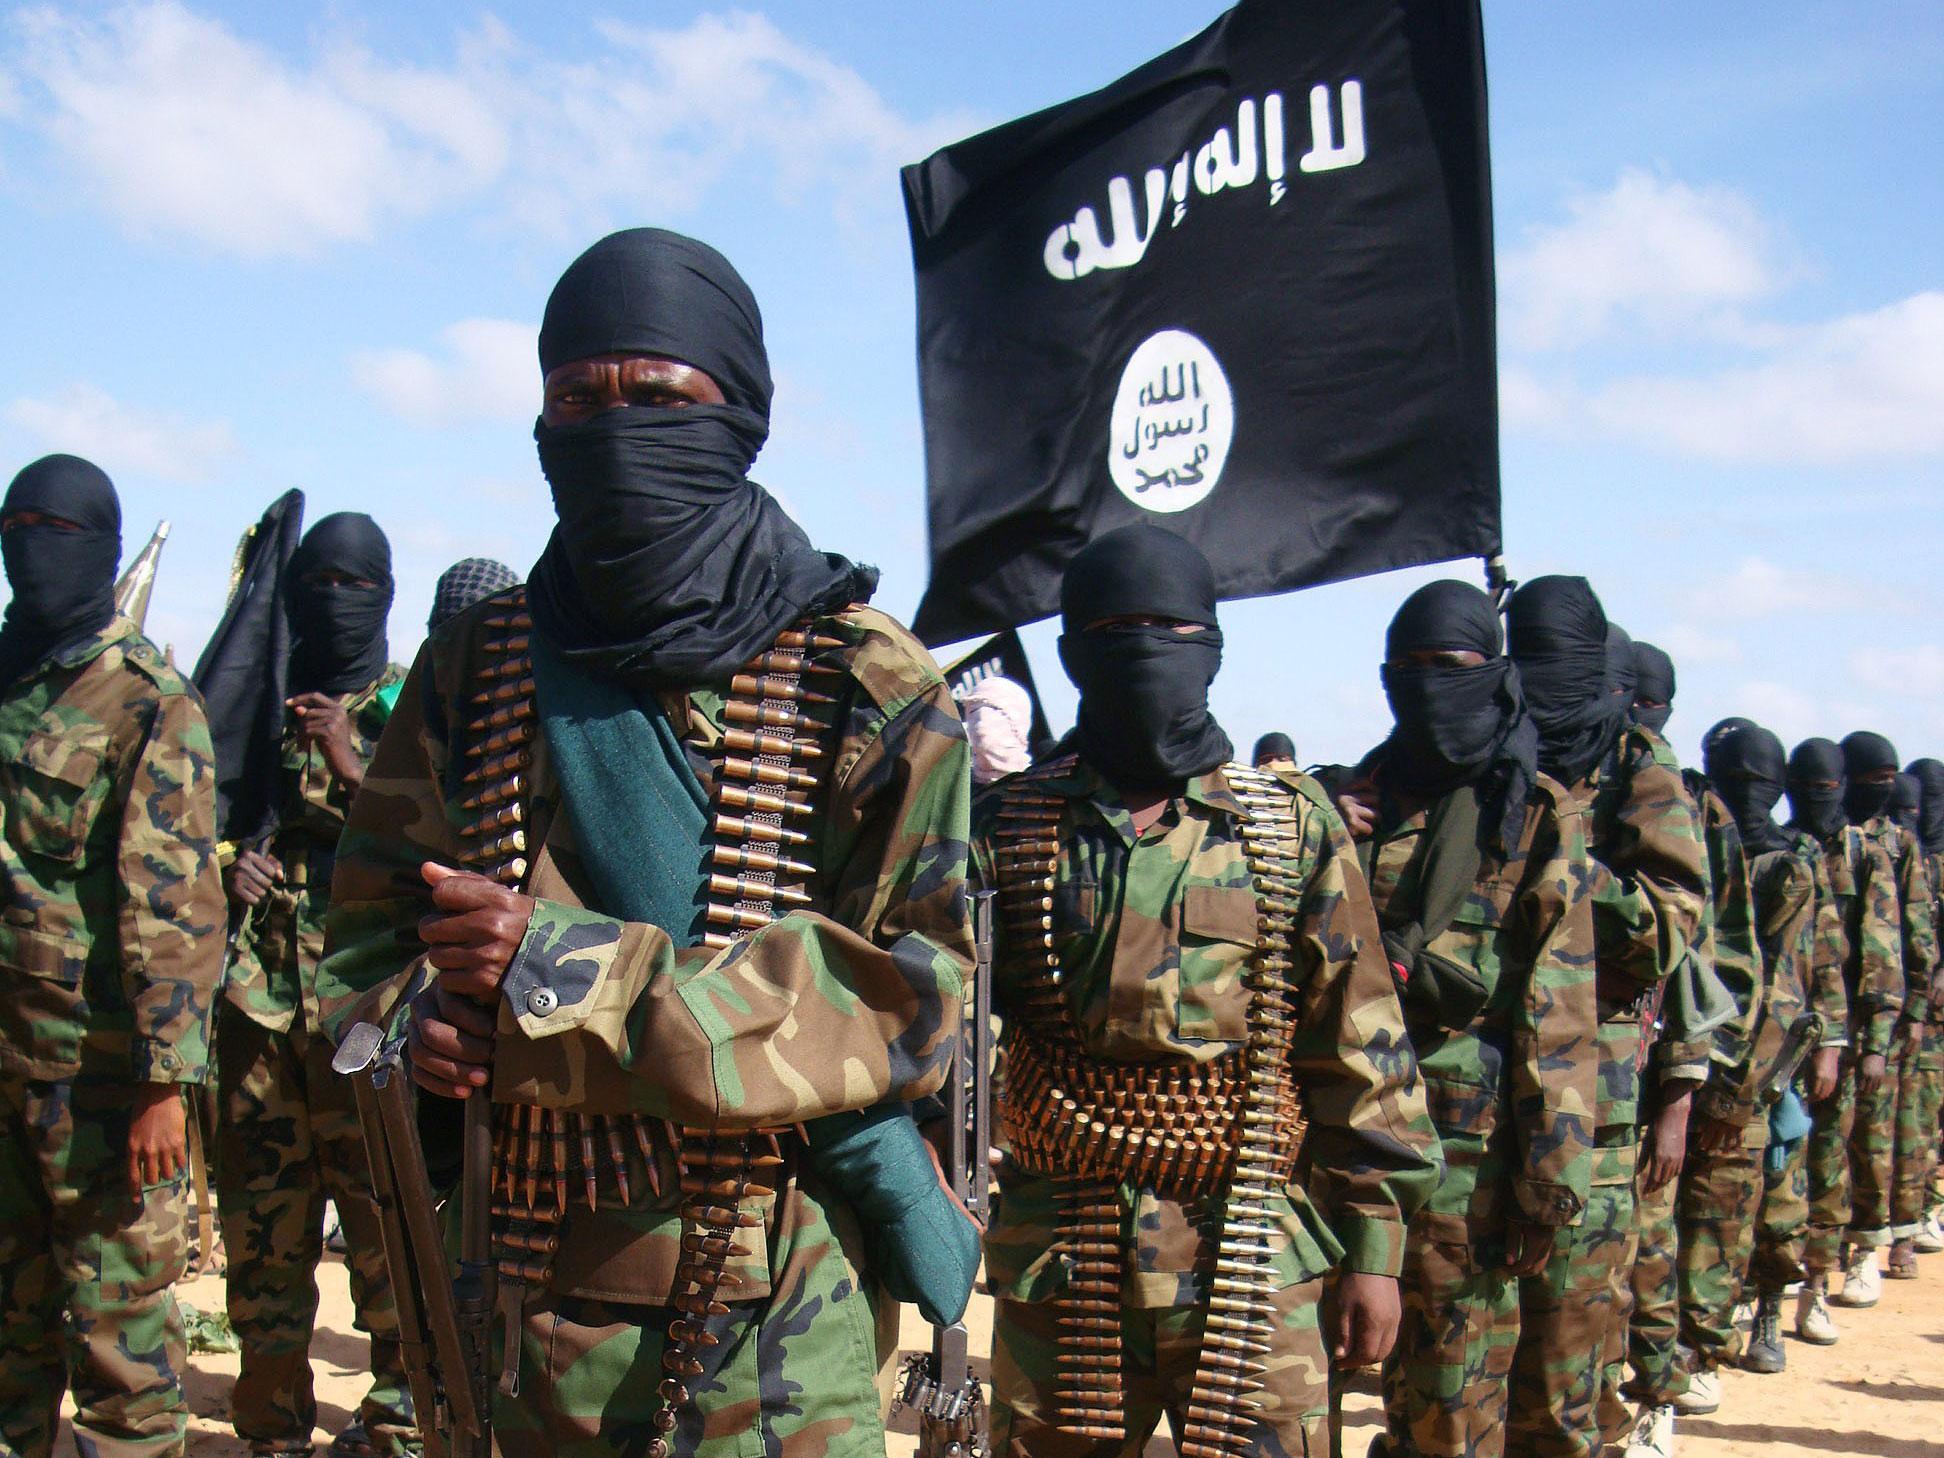 ISIS: Anti-Islamic Criminal Organization That Has Misappropriated Islam